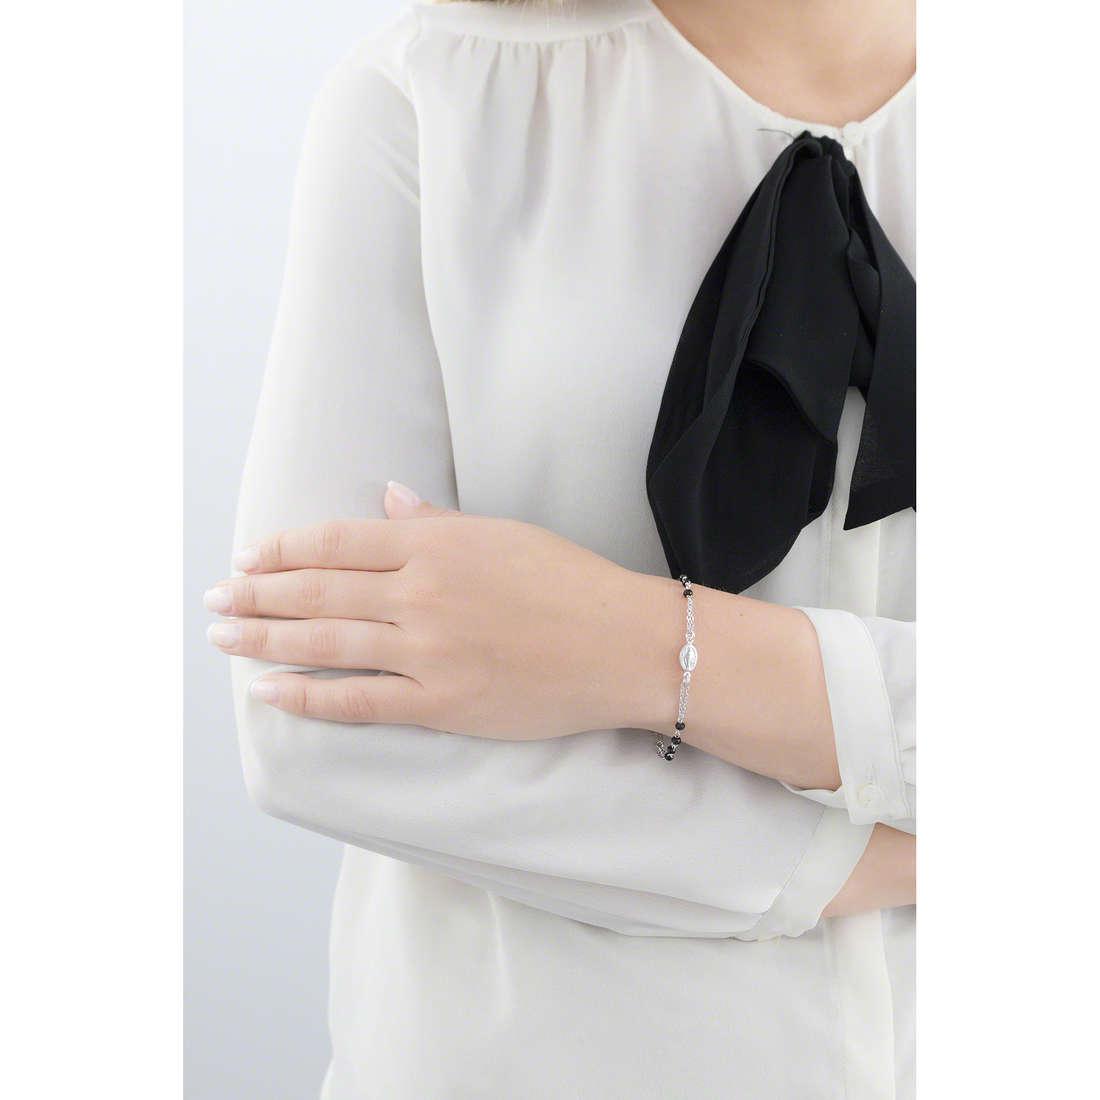 Amen bracciali Rosario donna BROBNZ3 indosso